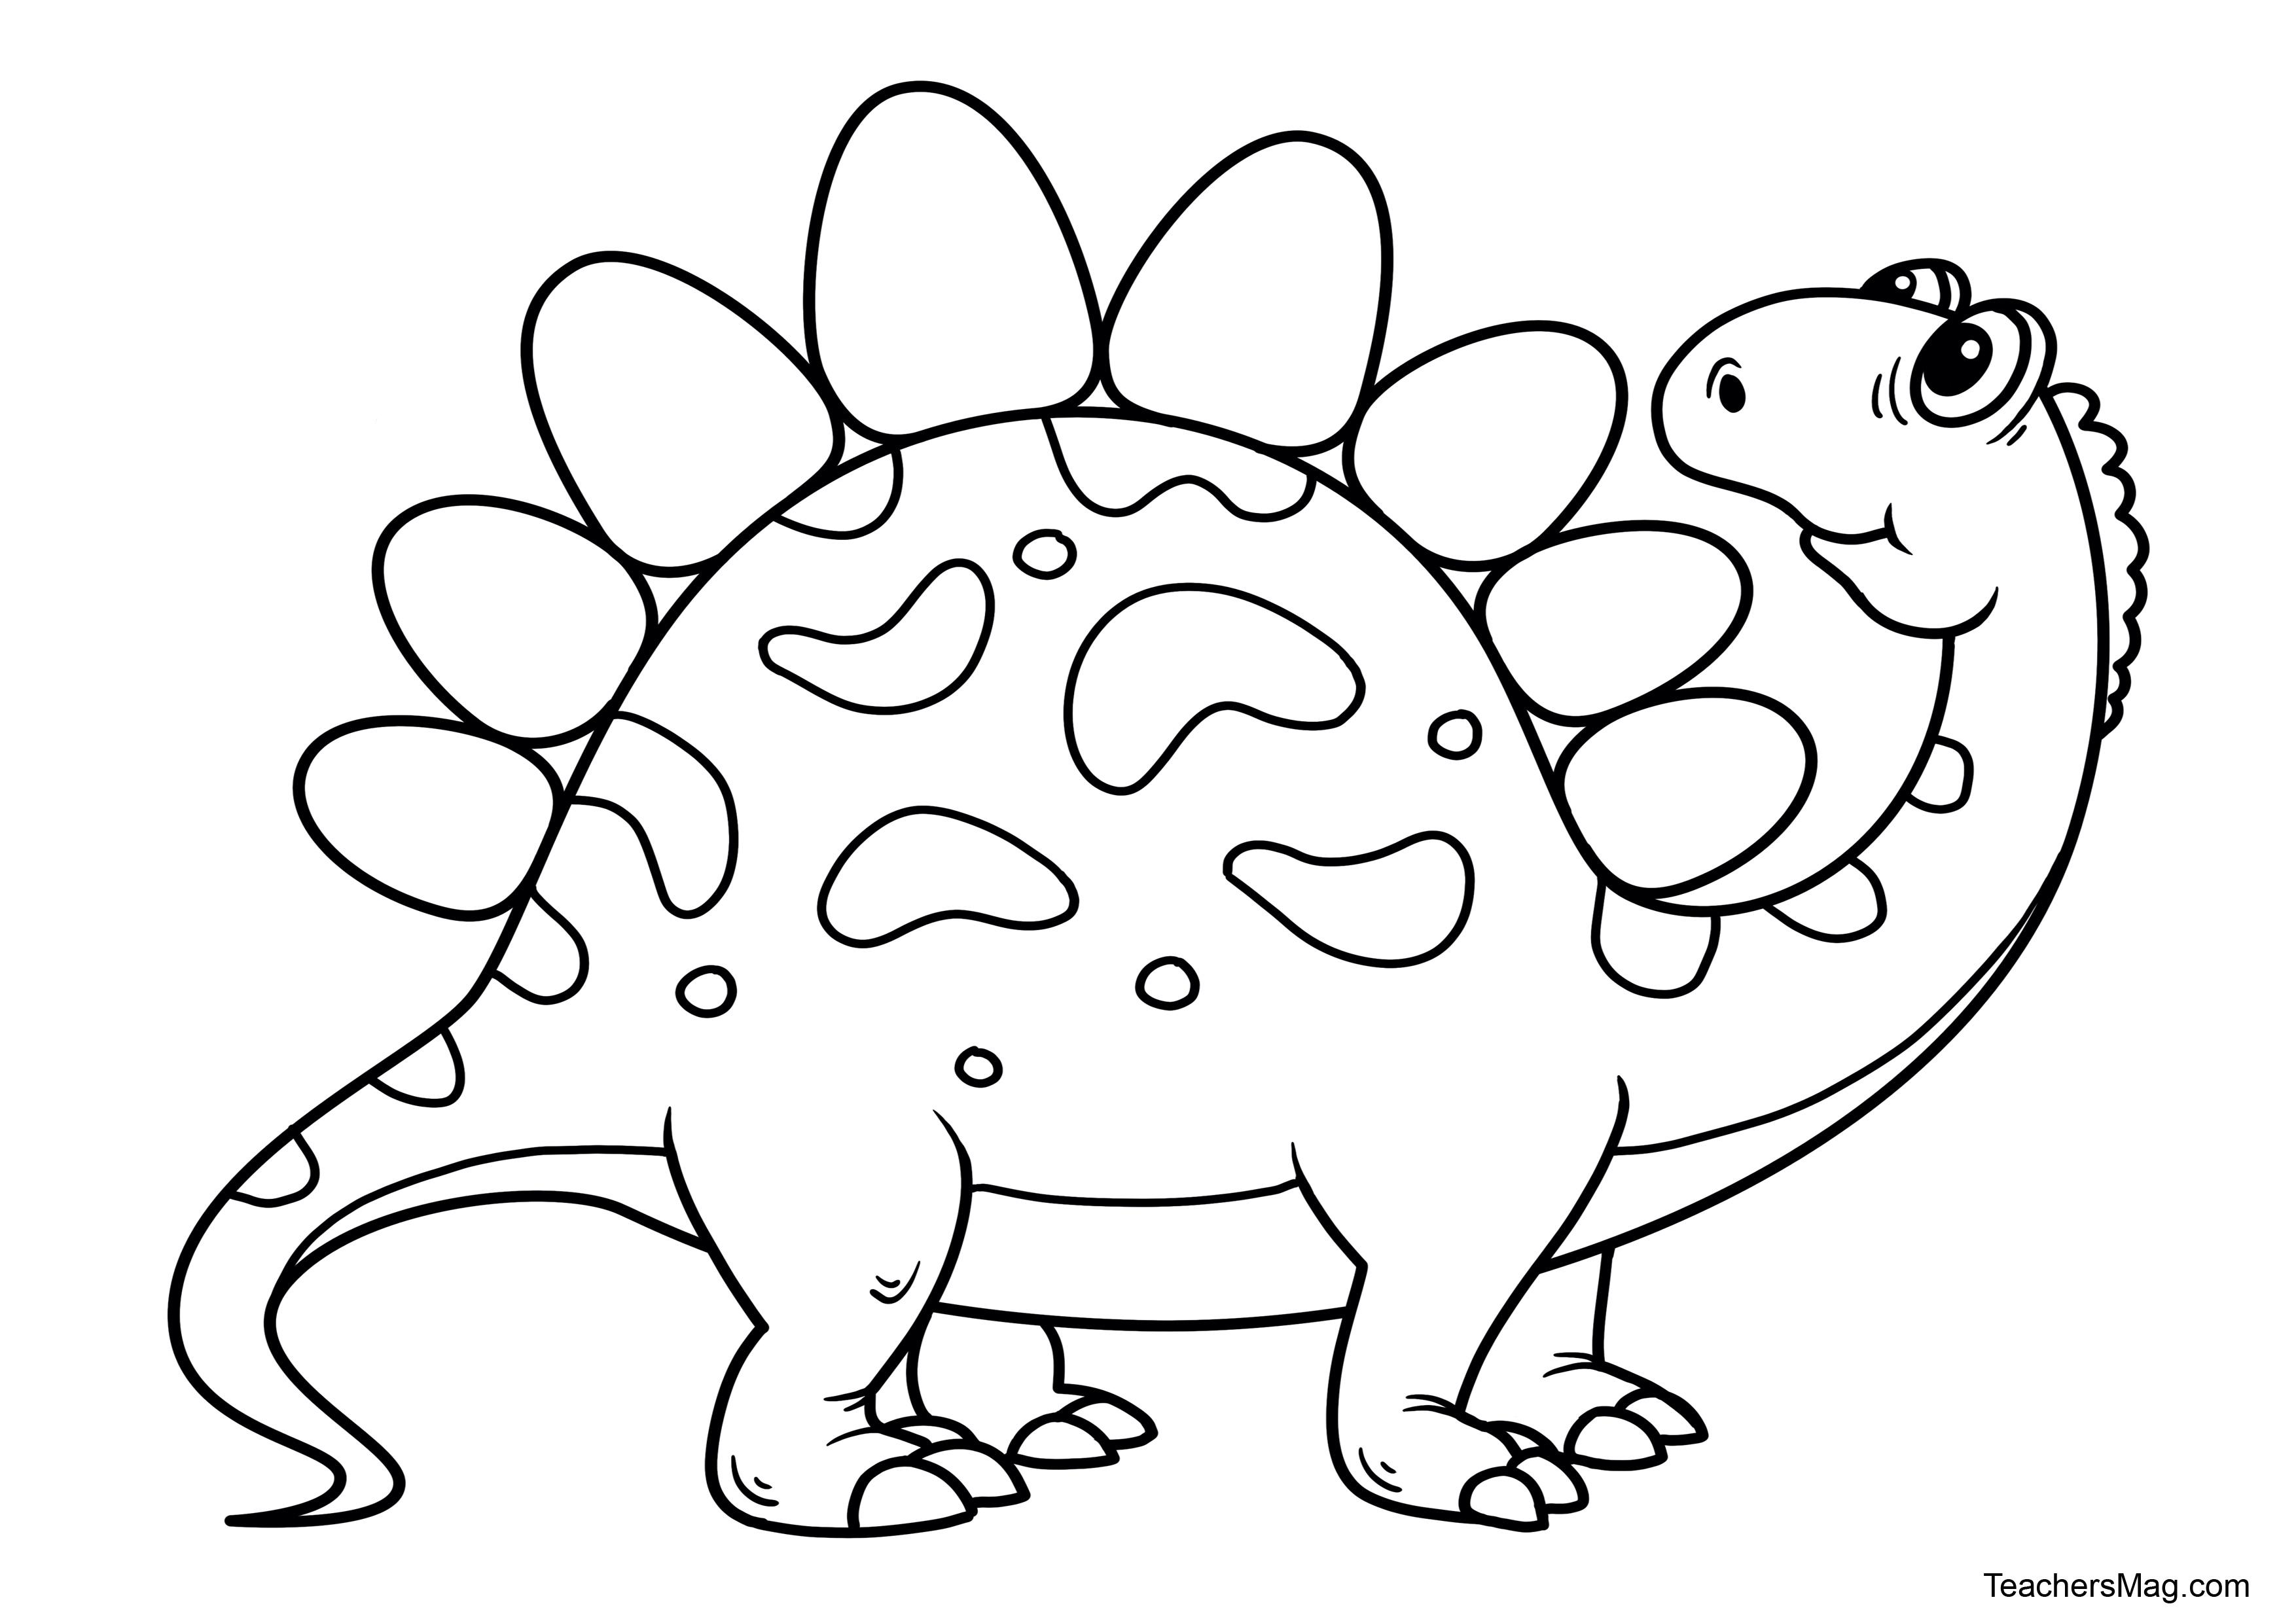 Free Dinosaur Printables for Preschool | TeachersMag.com